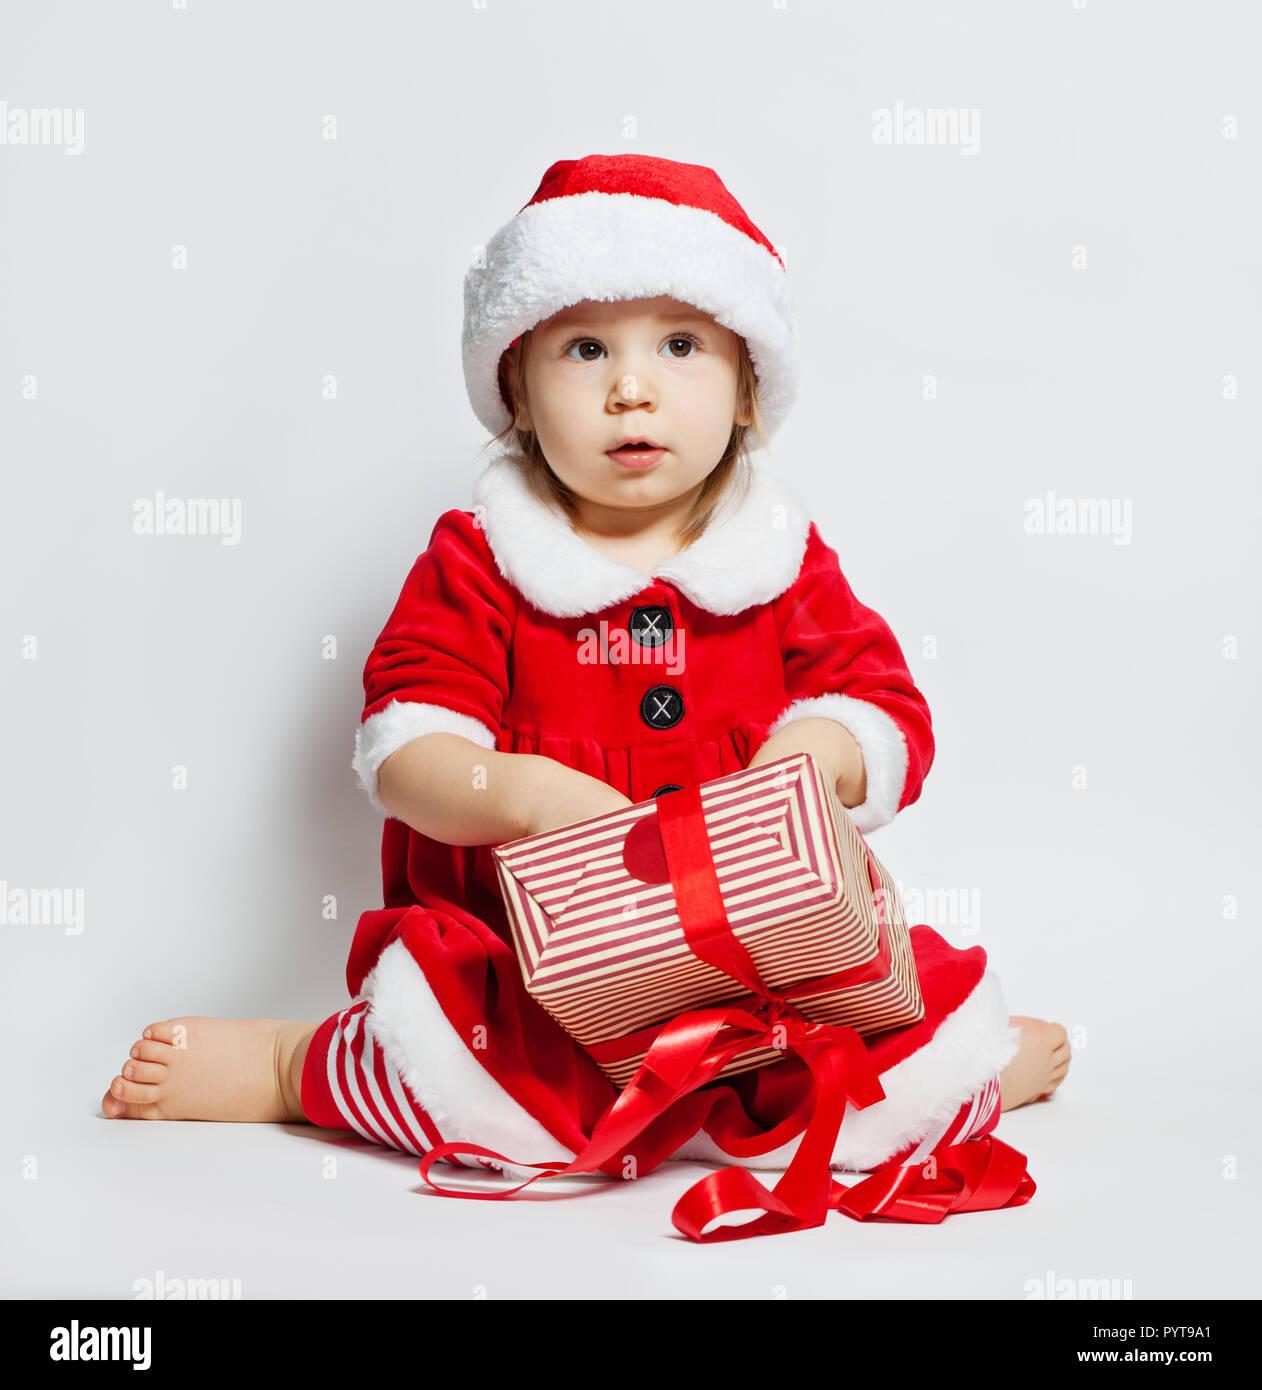 7c5b66b6392 Christmas child in Santa hat opening Xmas gift box on white background